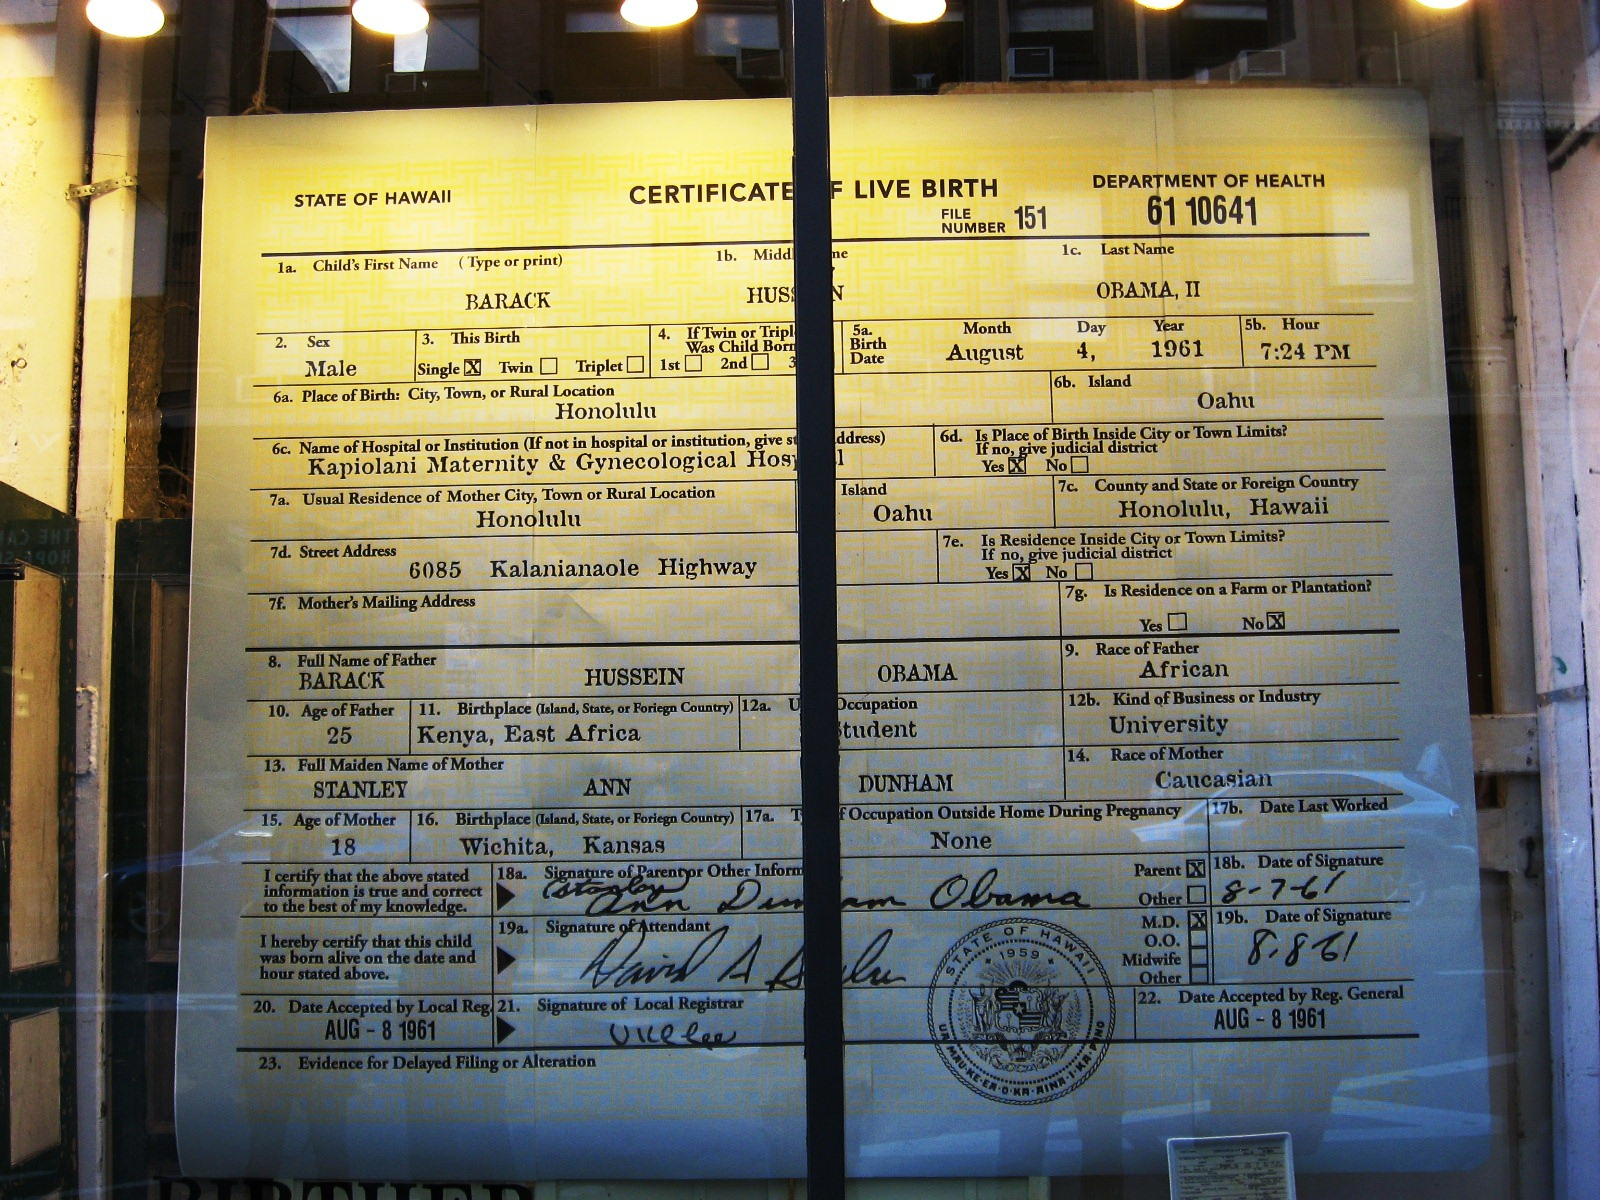 obama certificate glass dinnerware barack hussein york subway tray window eddy fishs display infidel urban